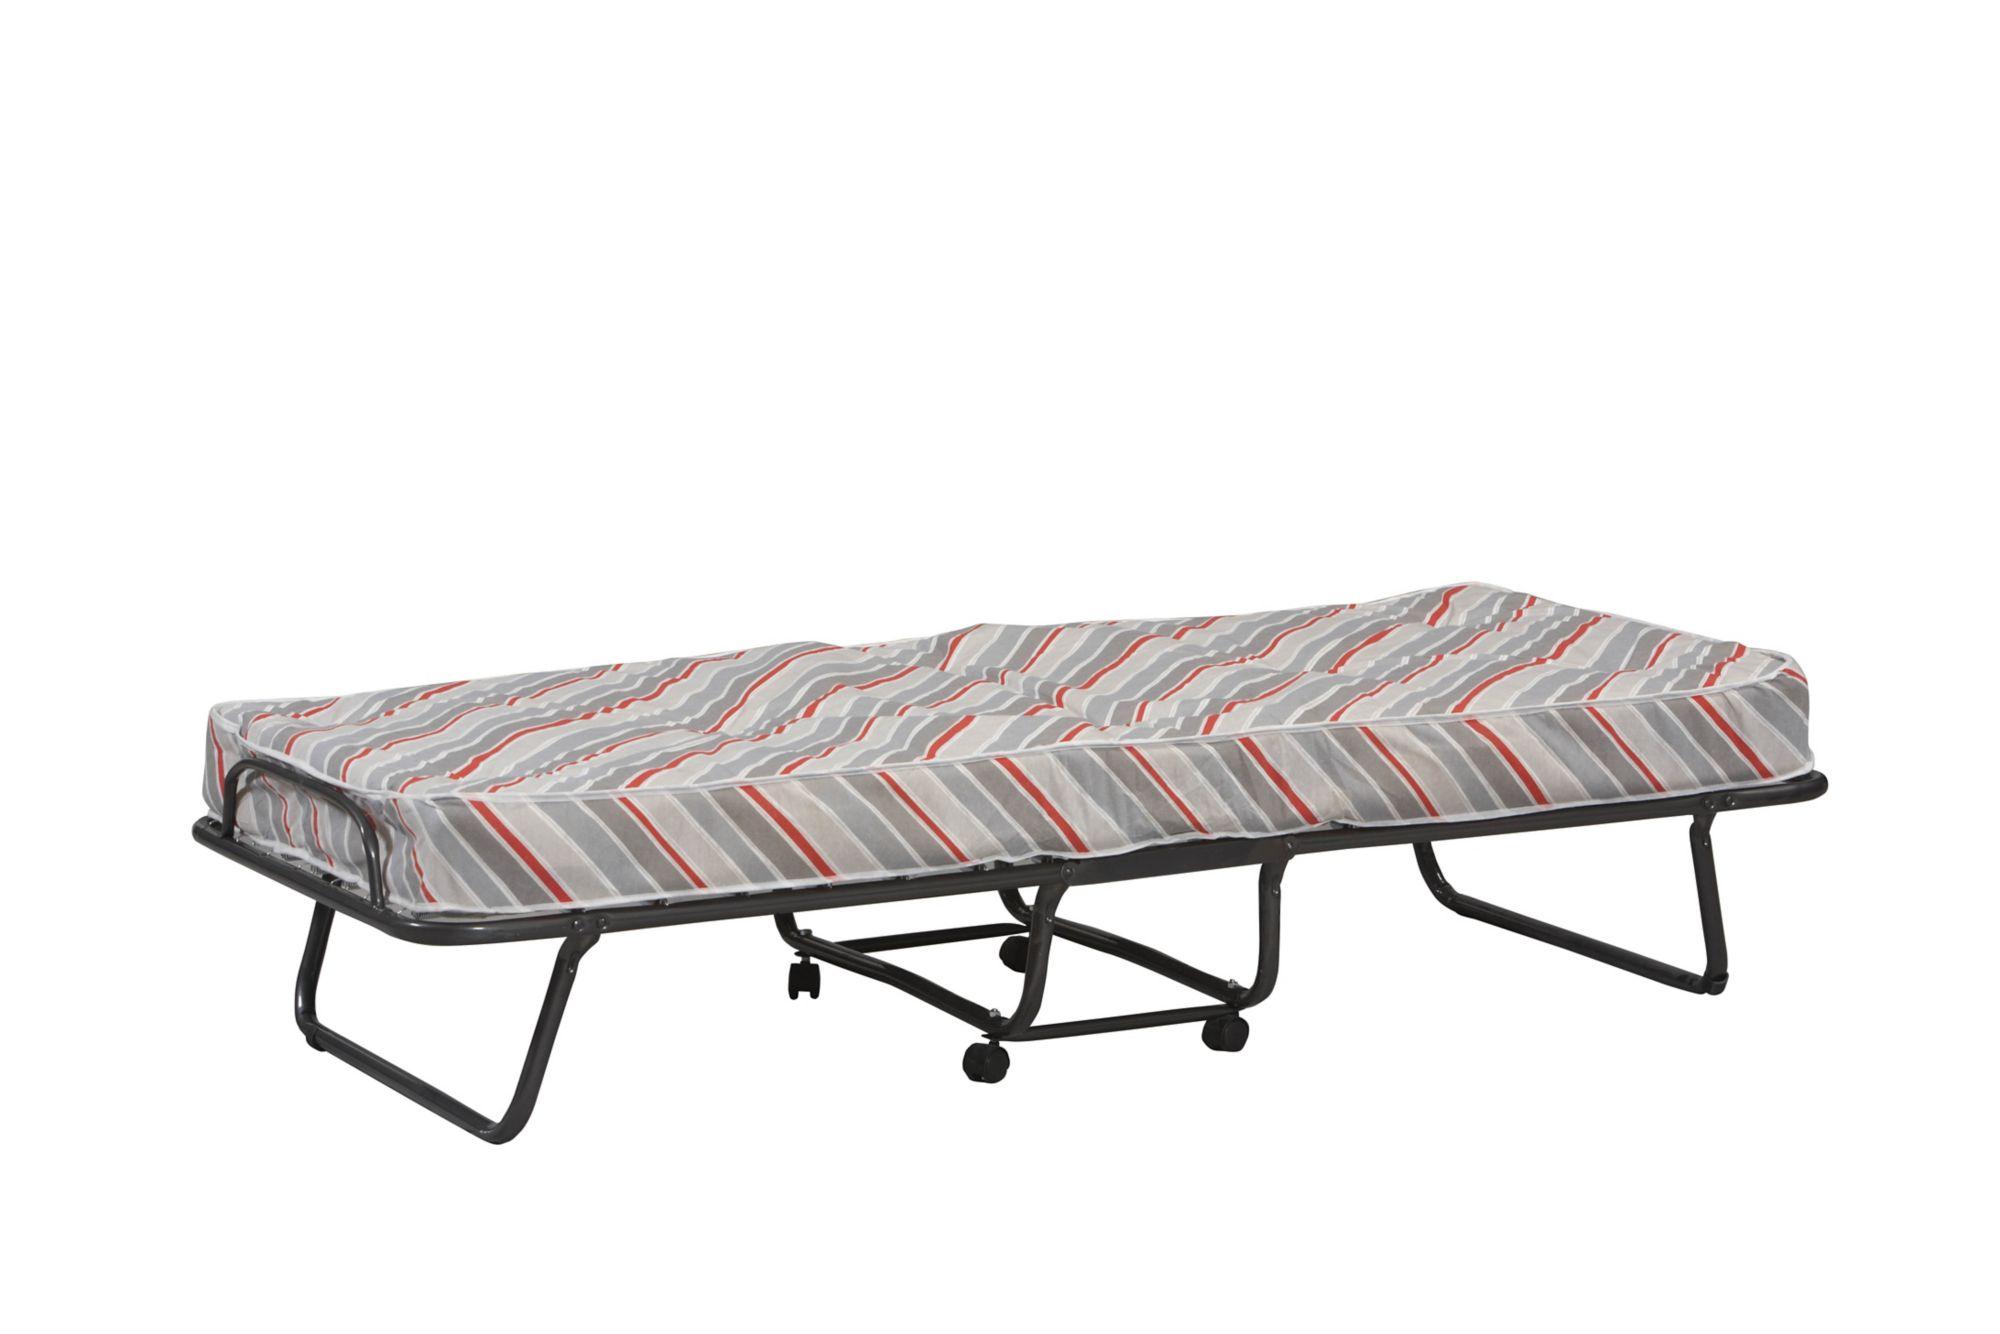 Picture of: Linon Torino Ultimate Folding Bed Multicolor Bjs Wholesale Club